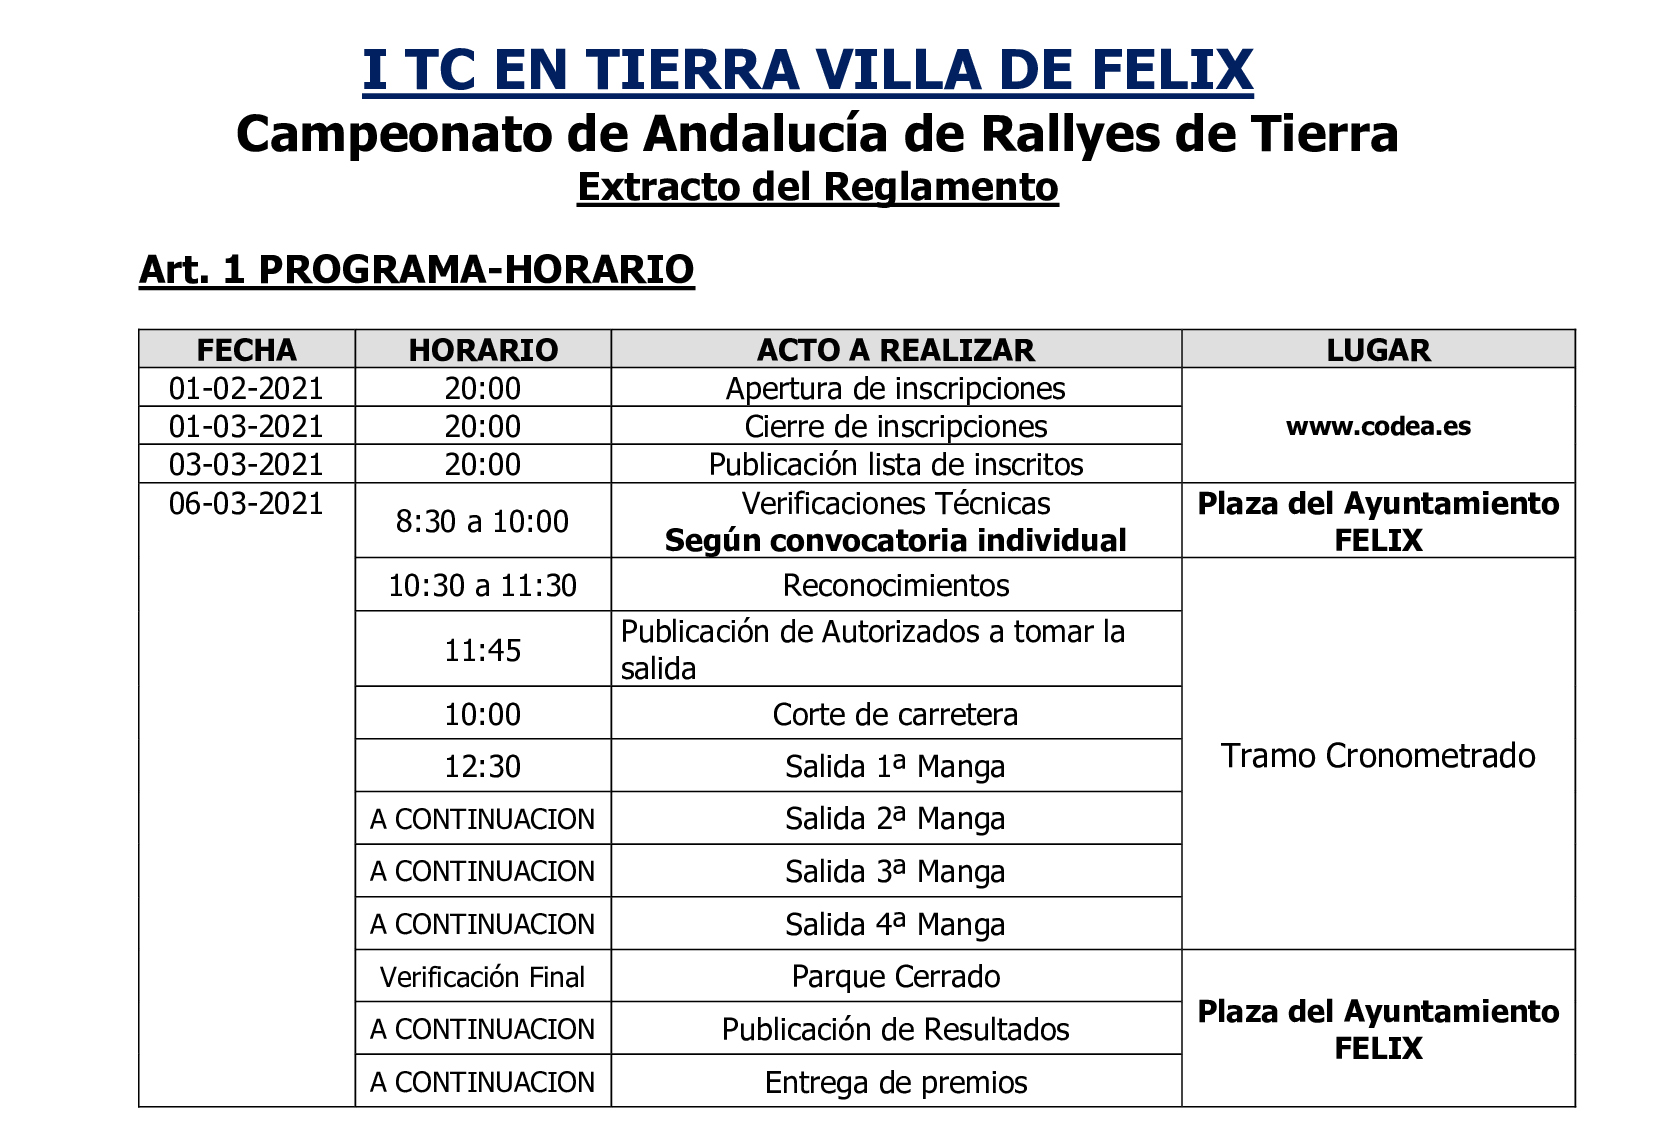 Horarios 1 TC Tierra Villa de Felix 2021